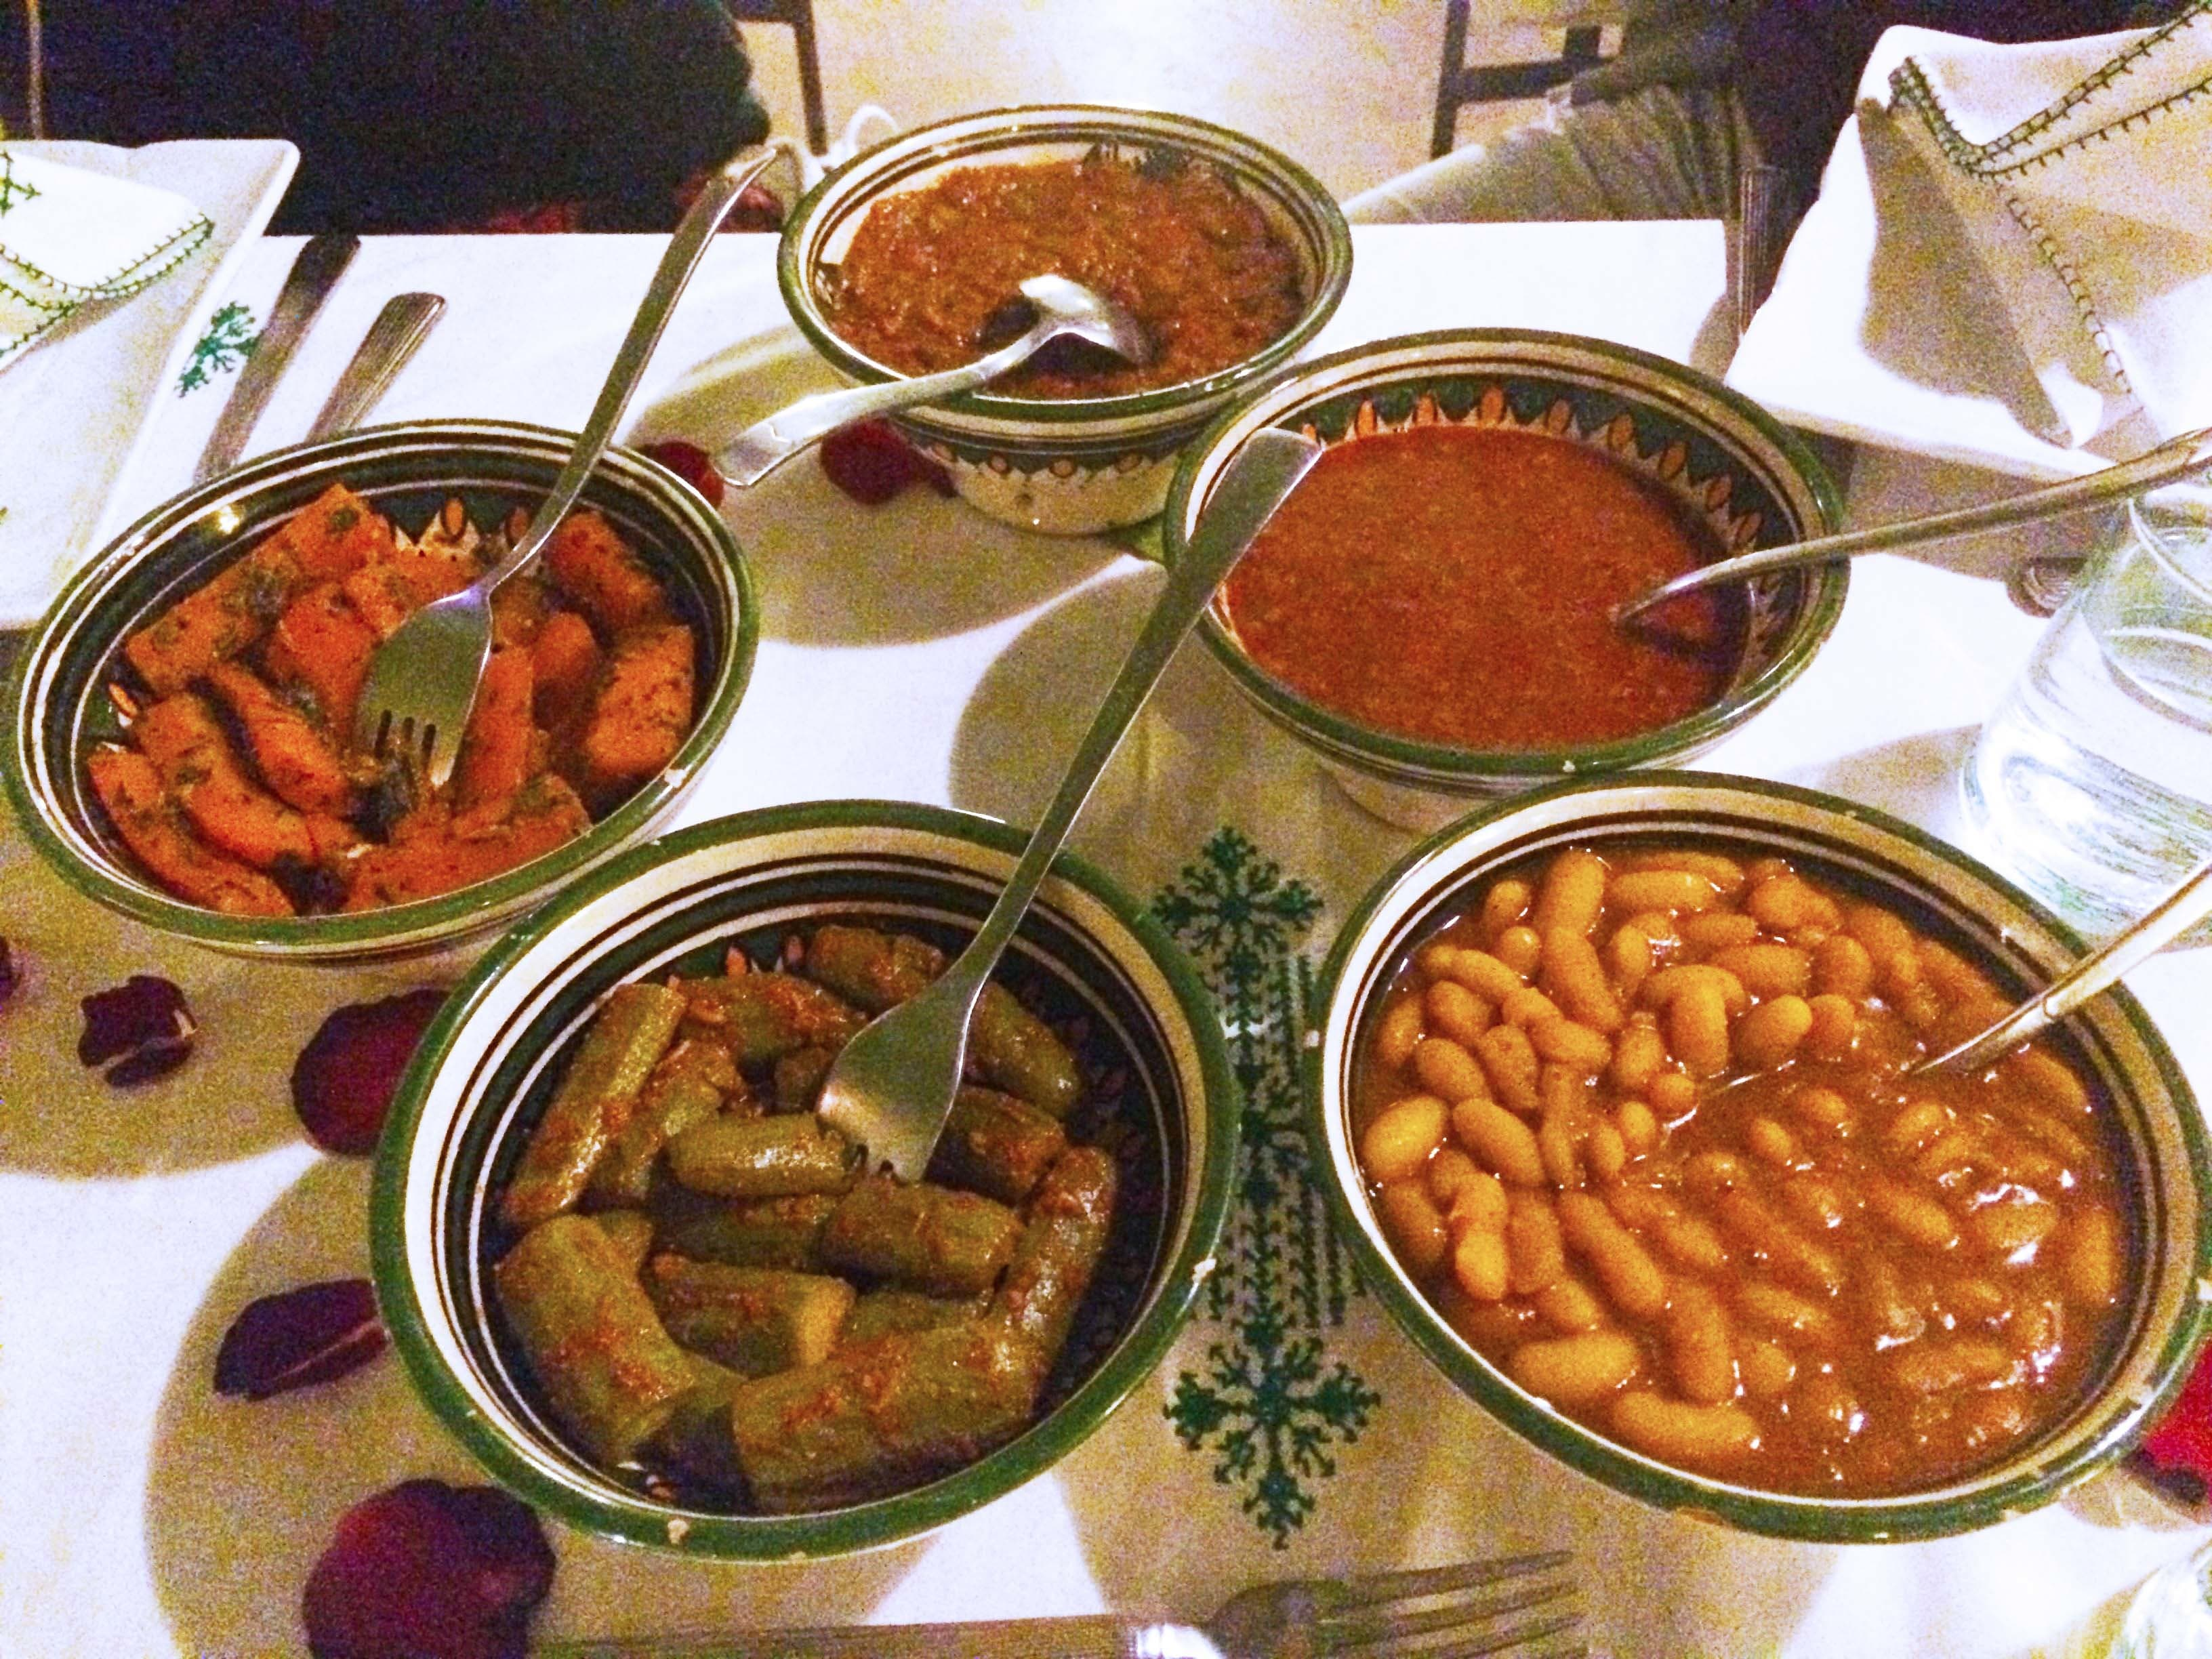 Moroccan Mezze at Riad Karmela.